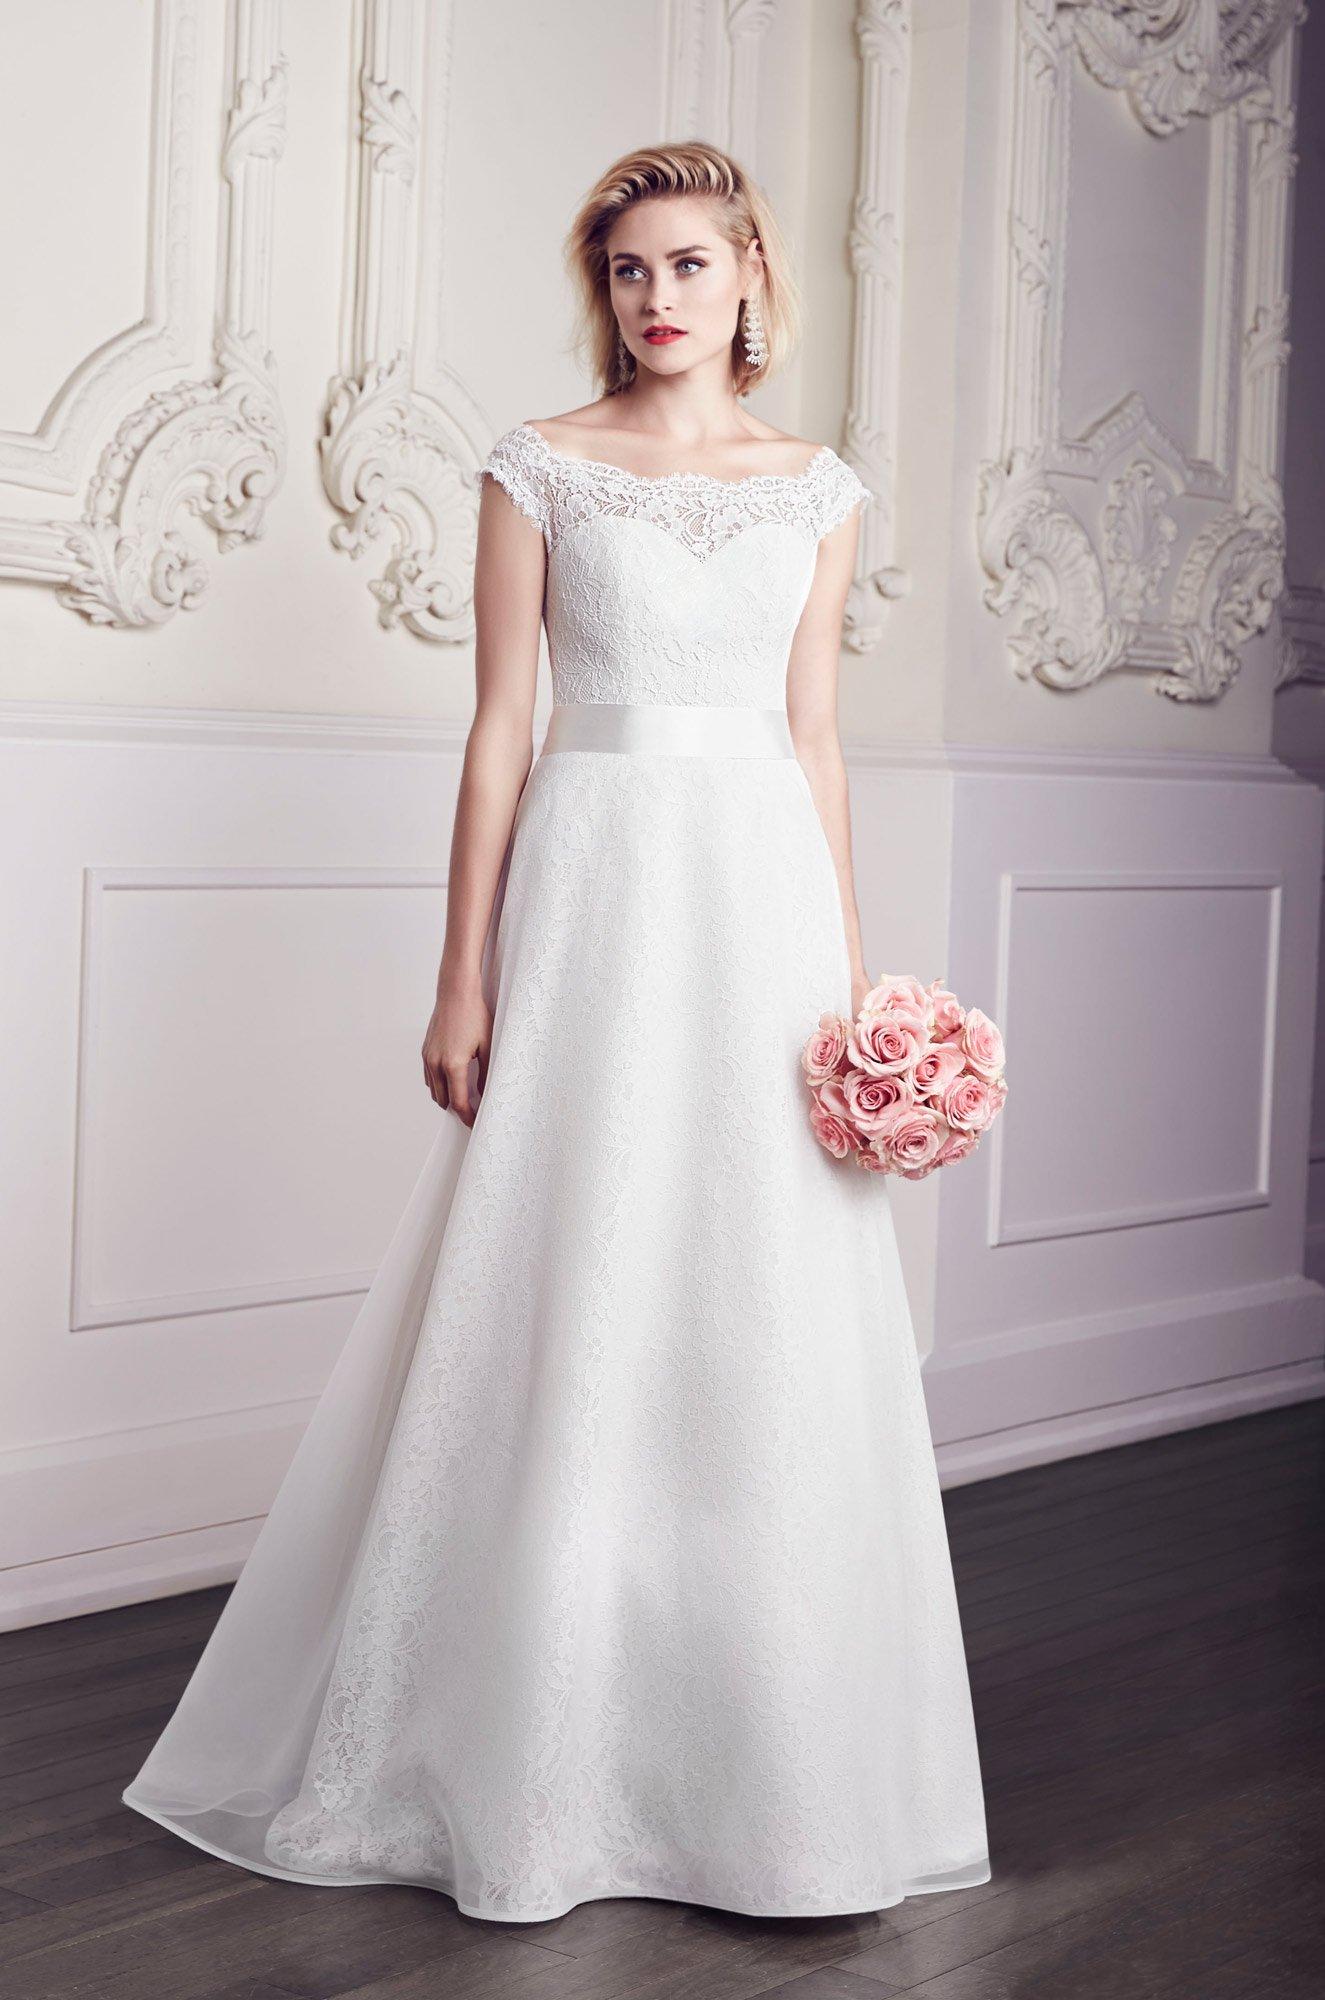 Organza Overlay Wedding Dress - Style #1959 | Mikaella Bridal